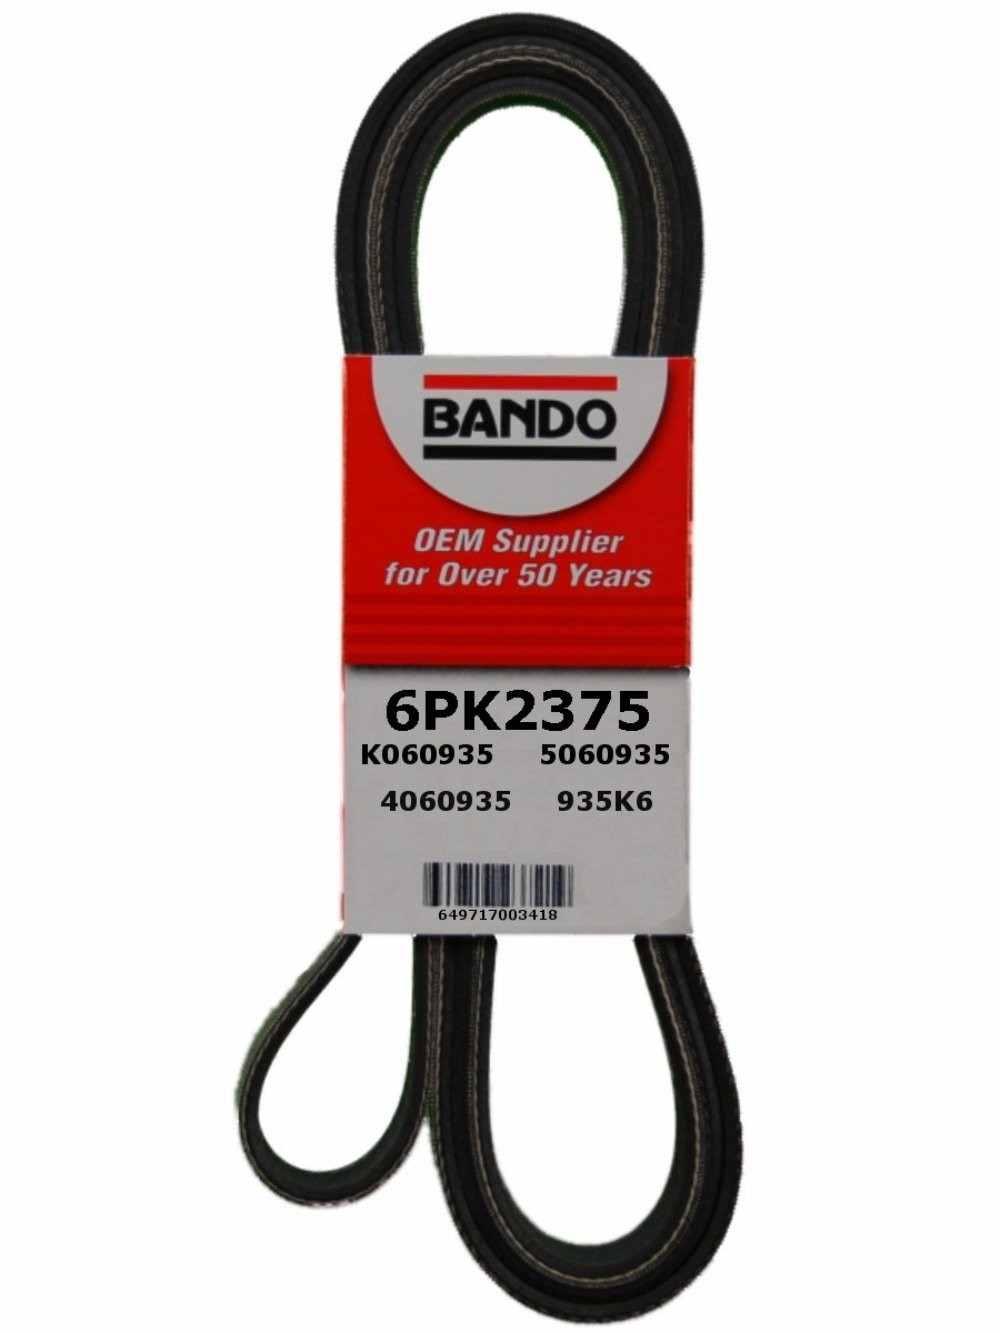 BANDO - Serpentine Belt (Water Pump, Alternator, Air Conditioning and Power Steering) - BWO 6PK2375